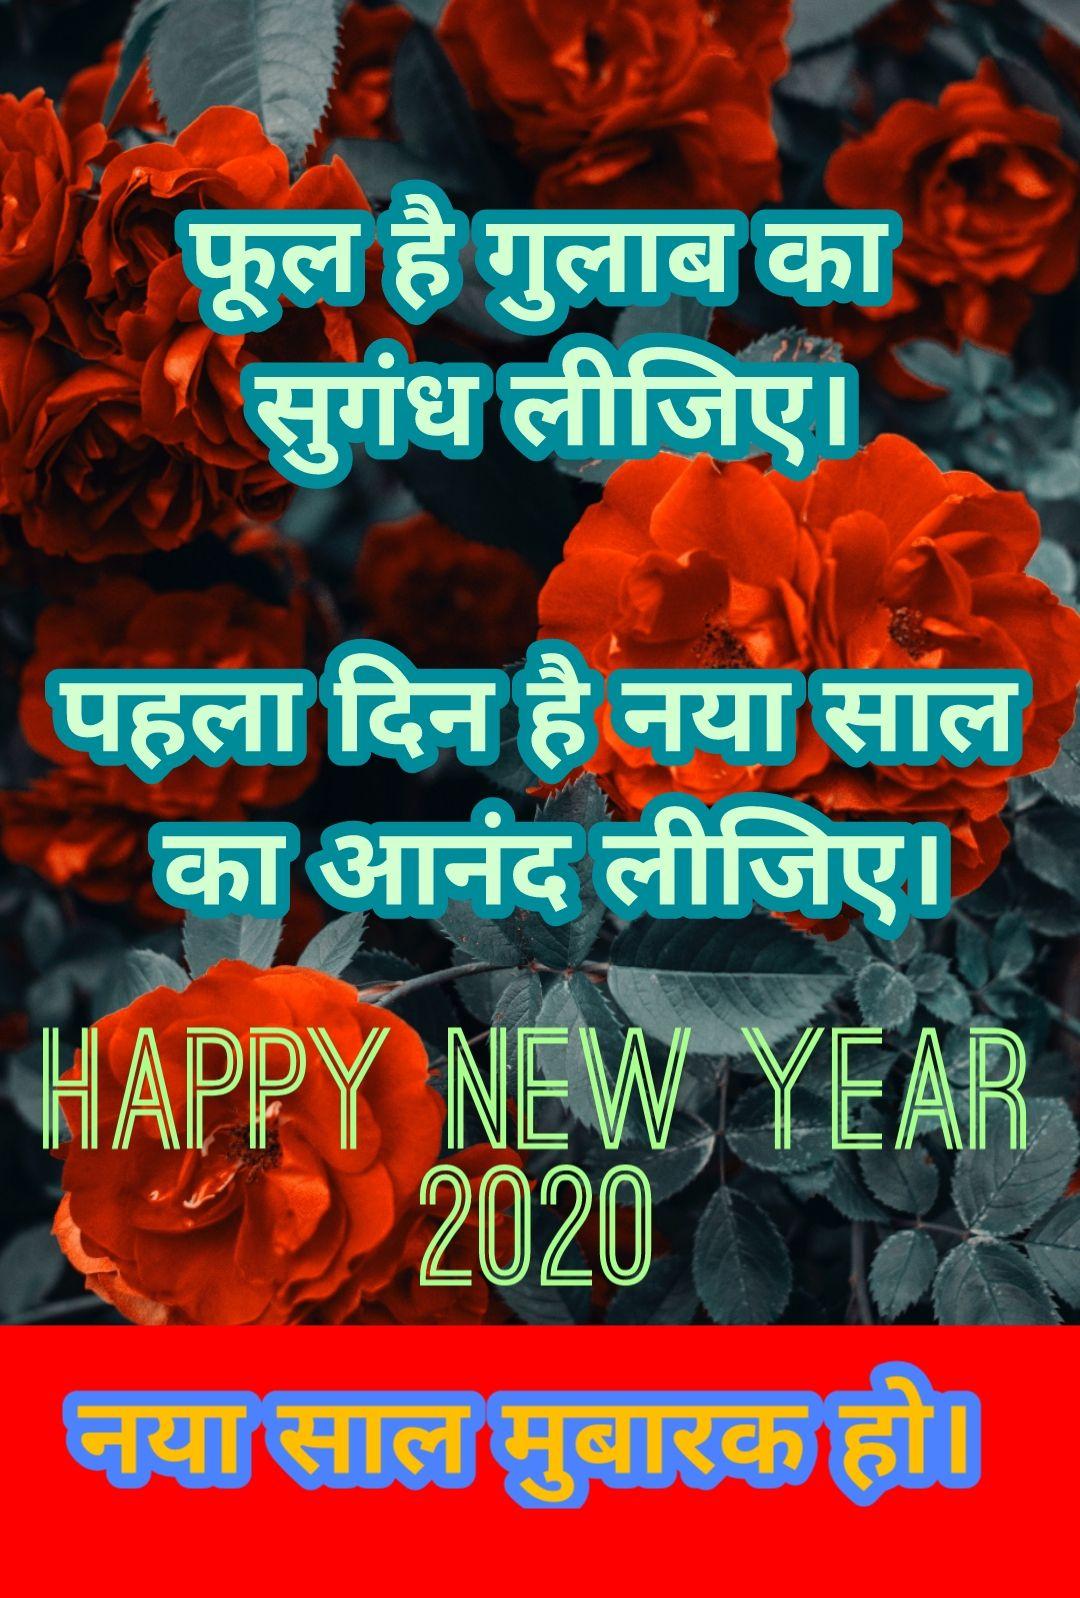 Happy New Year 2020 Shayari wishes in hindi Hd images